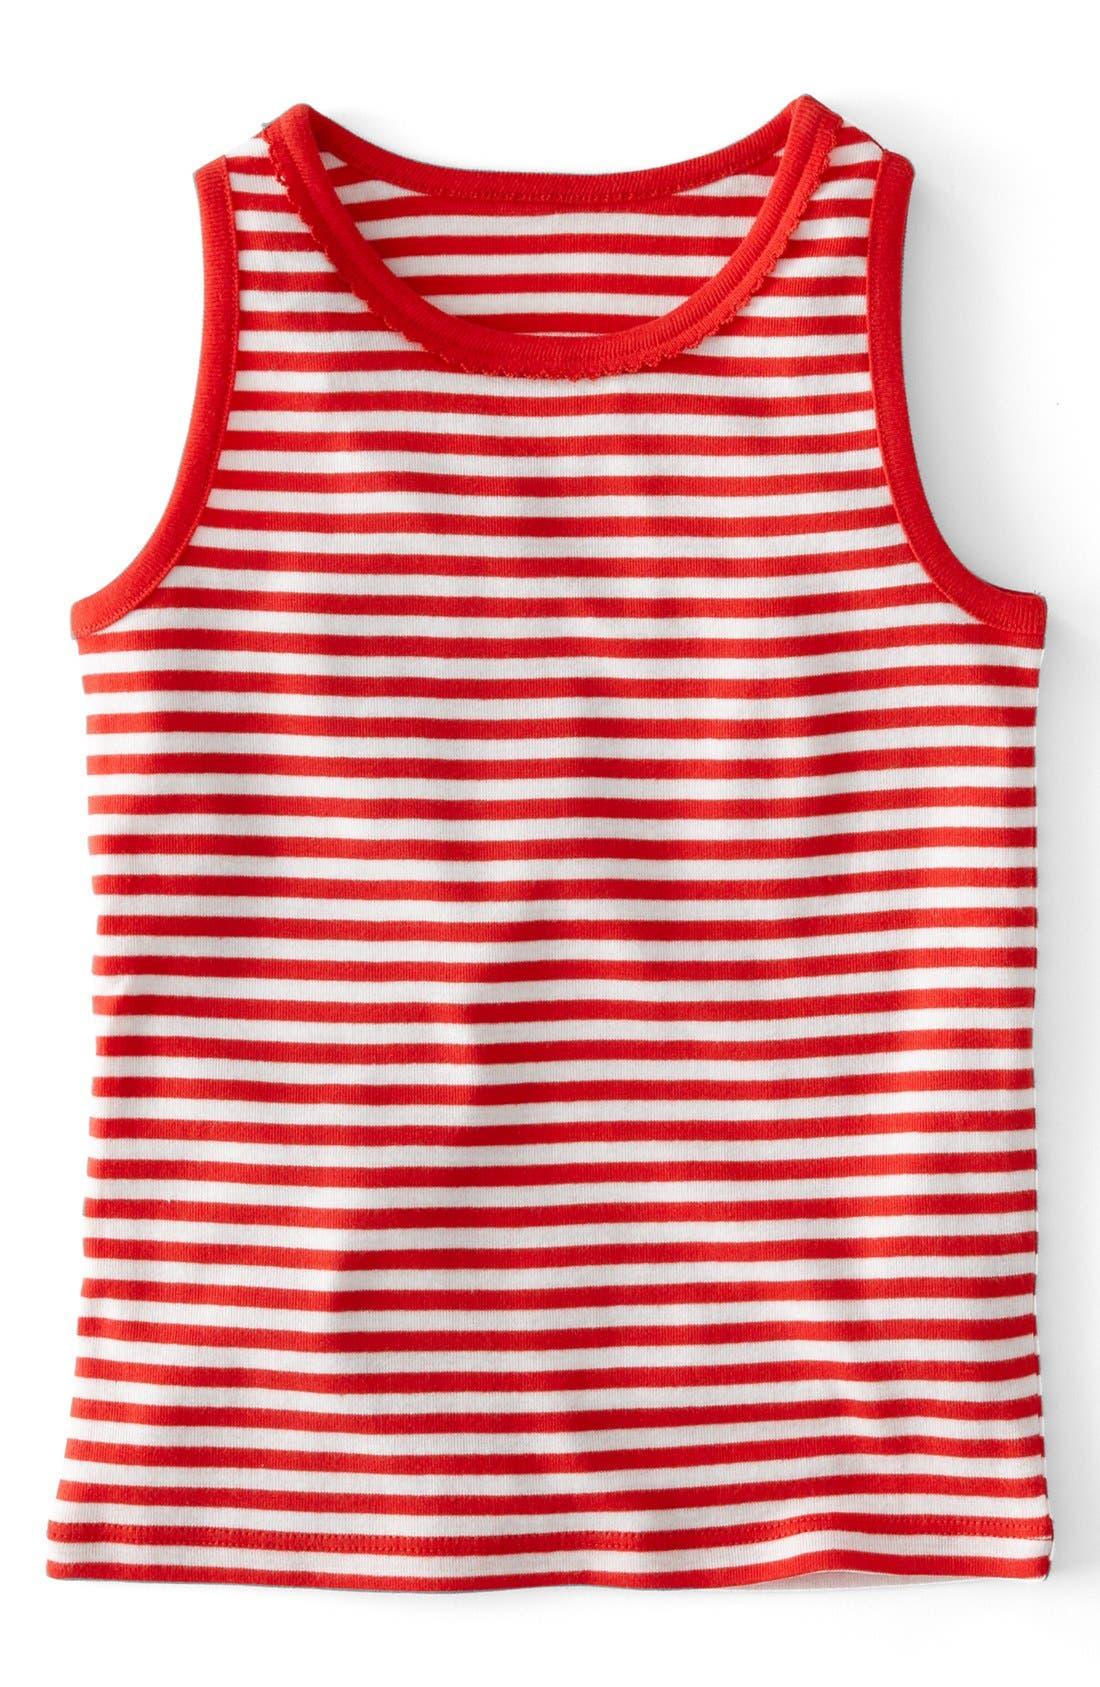 Alternate Image 1 Selected - Mini Boden Stripe Cotton Top (Toddler Girls, Little Girls & Big Girls)